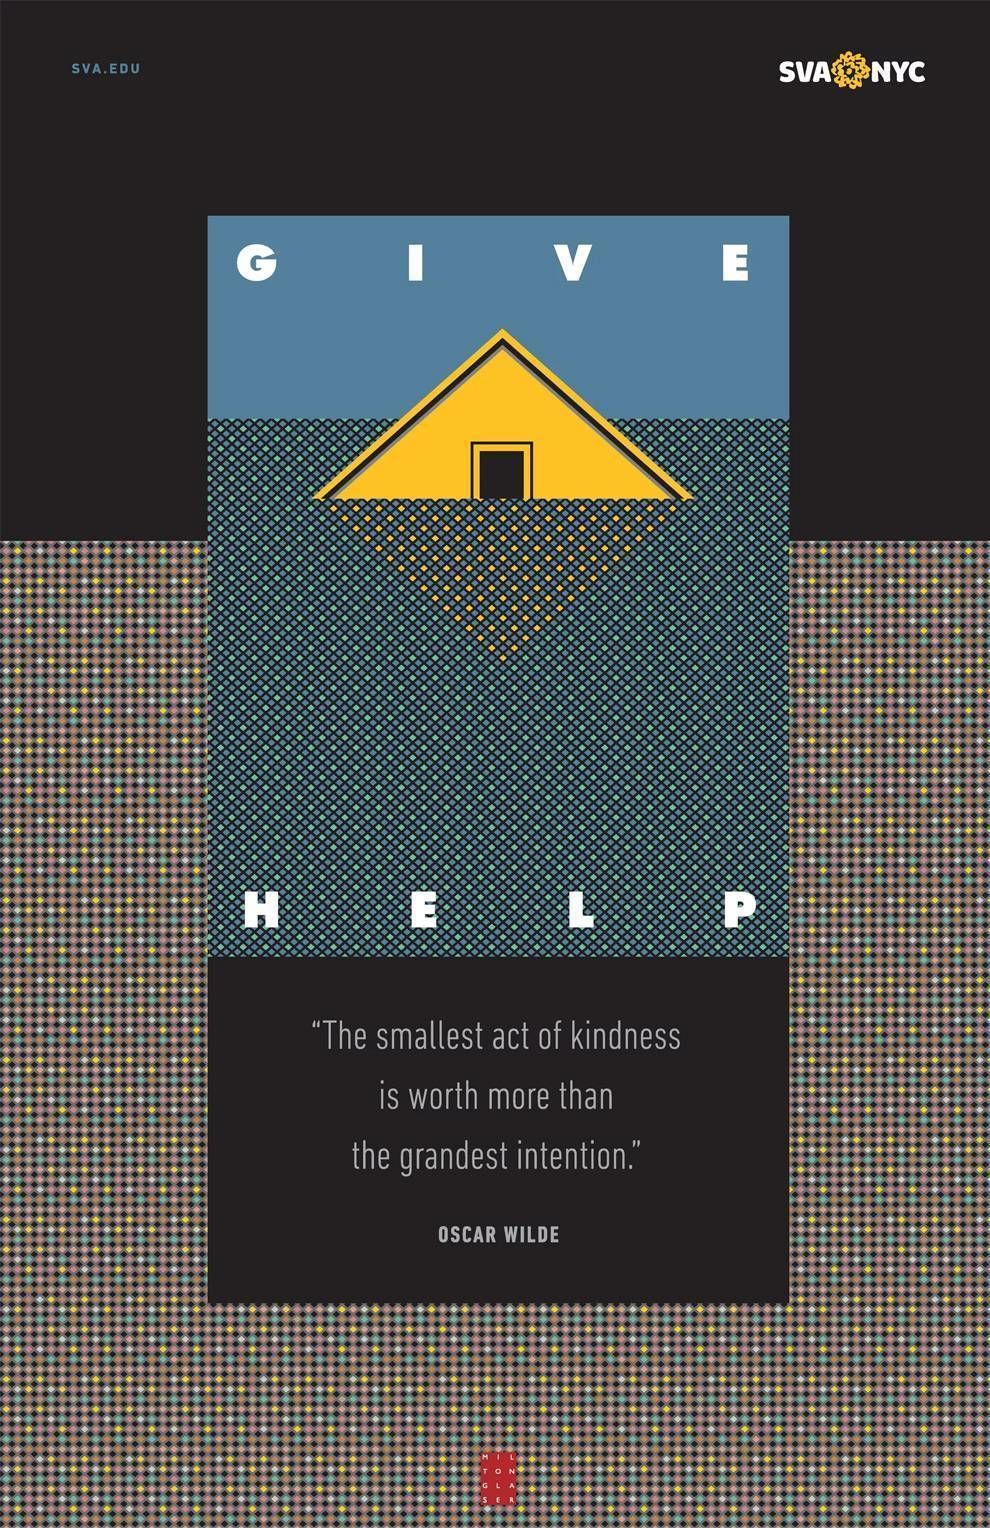 Milton Glaser's Underground Images Print Design